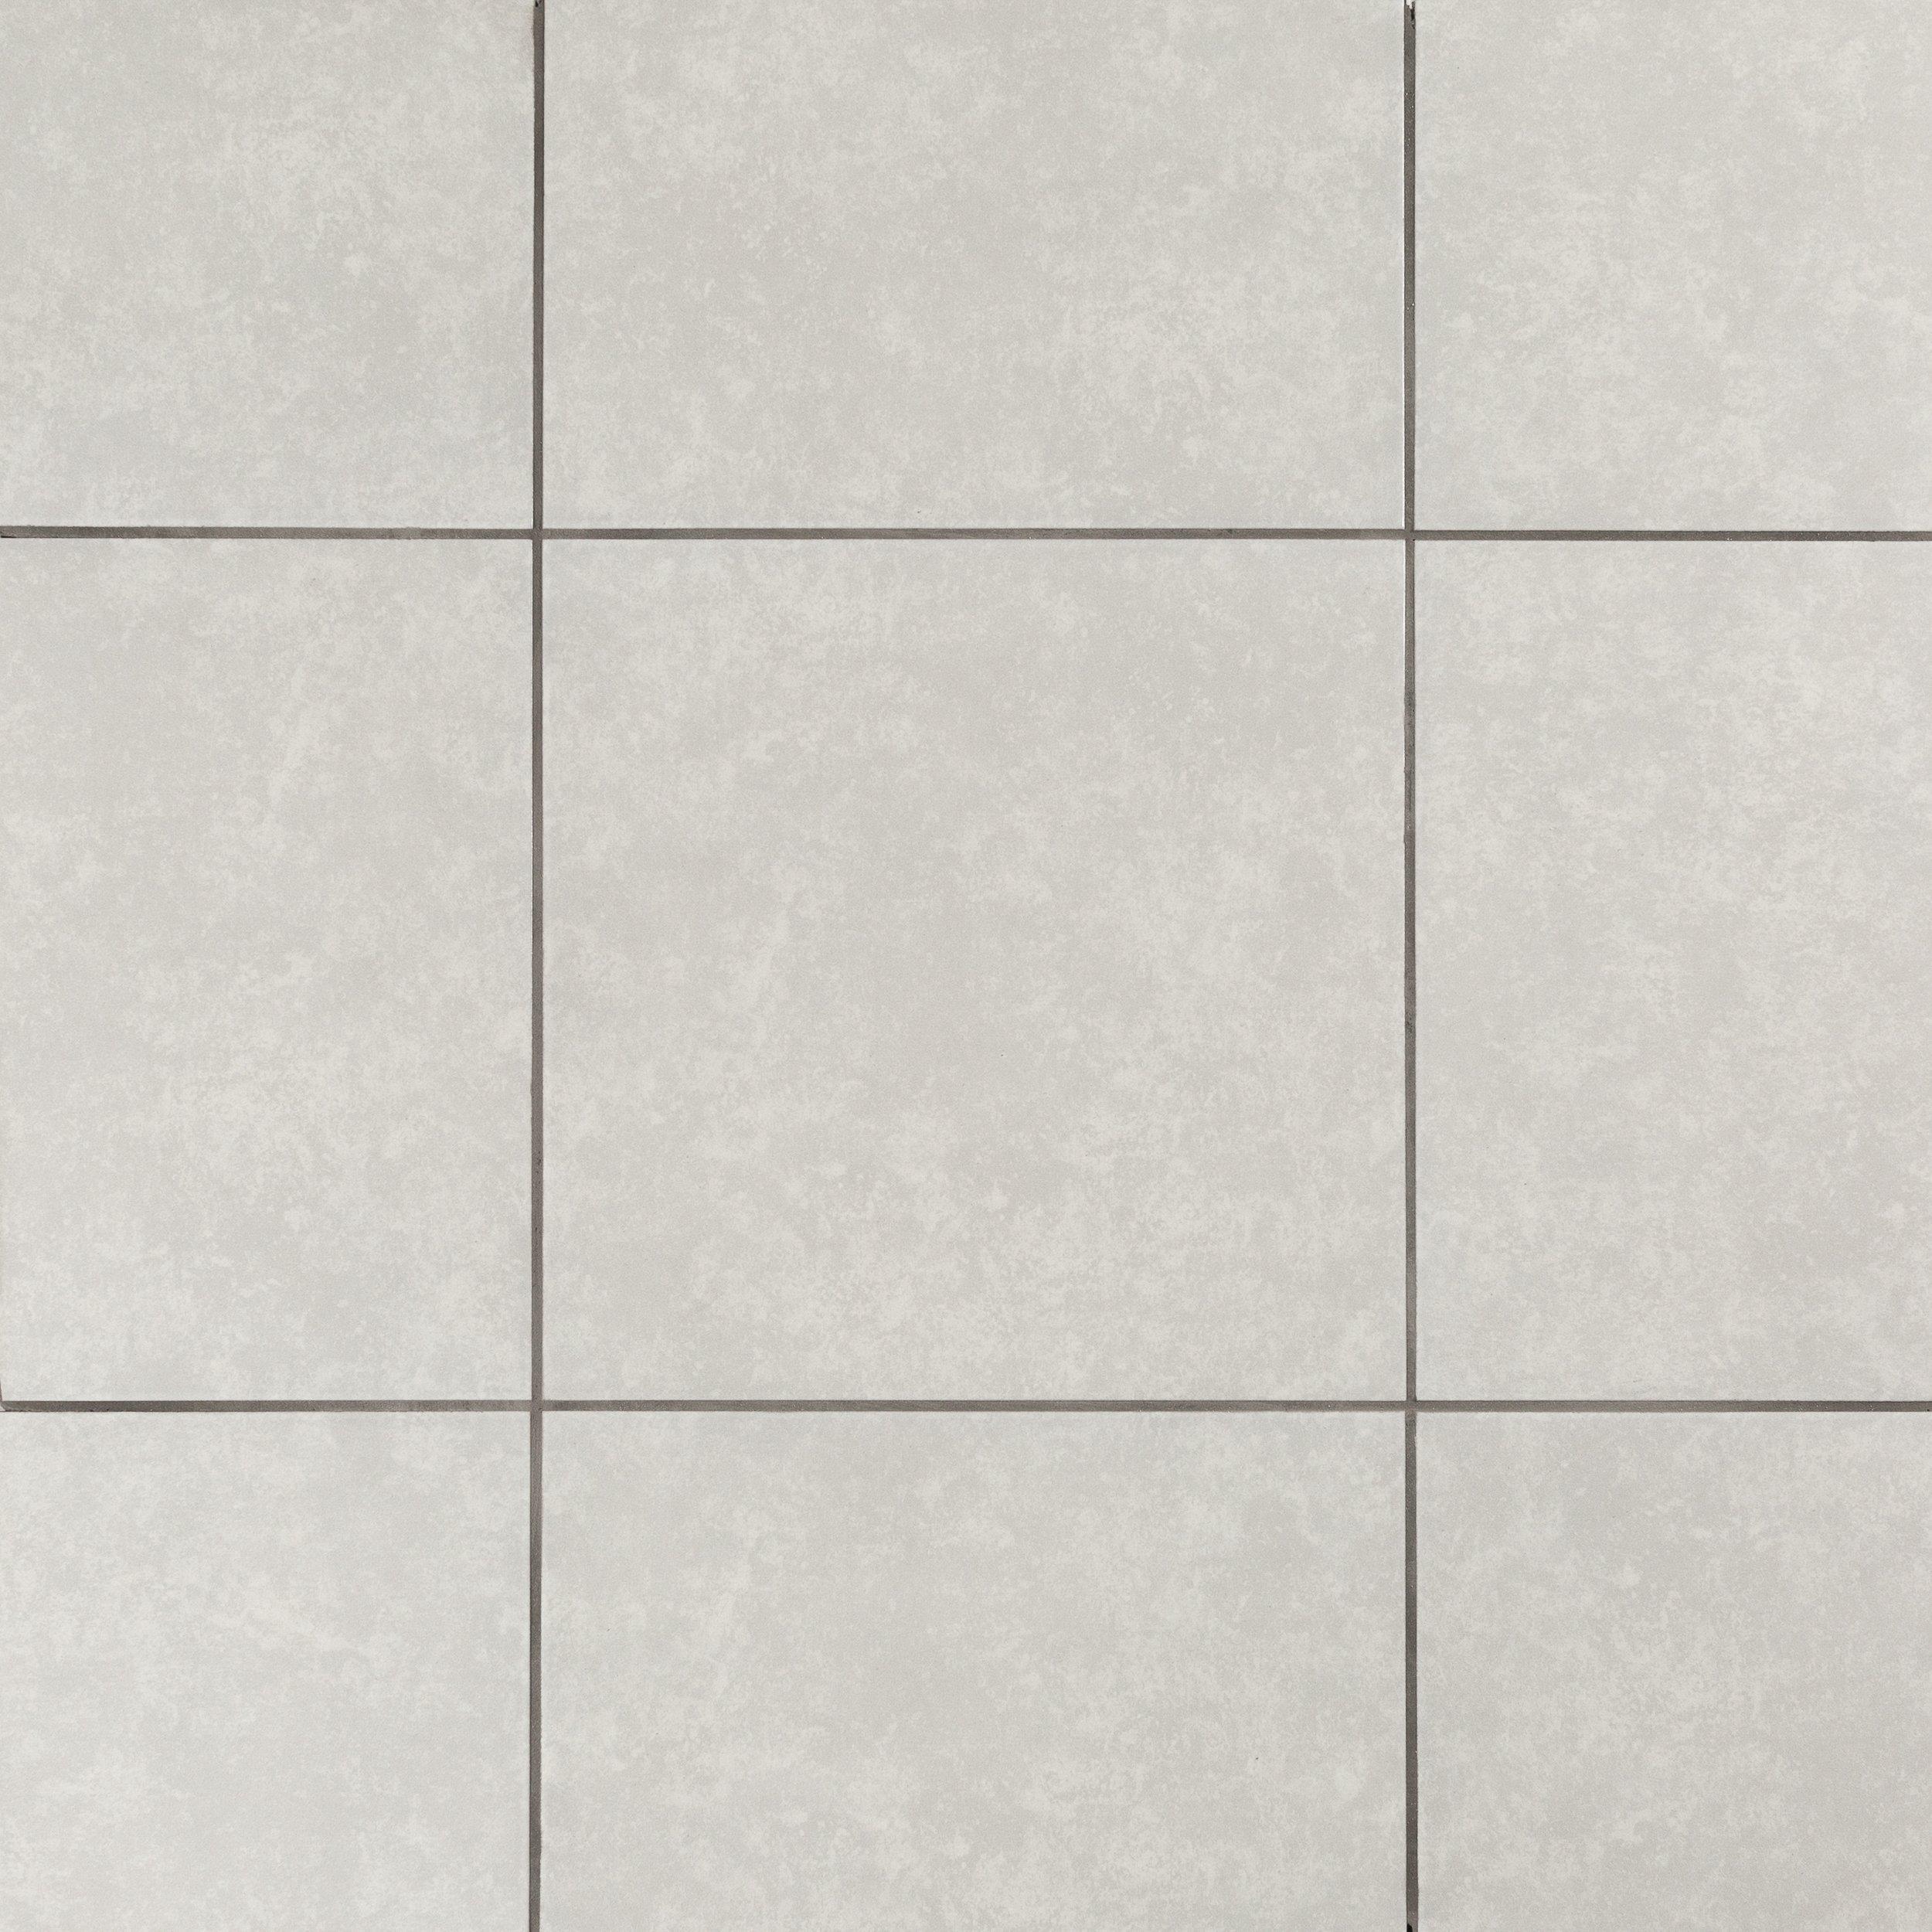 Roma gris ceramic tile 13 x 13 911104165 floor and decor roma gris ceramic tile dailygadgetfo Image collections